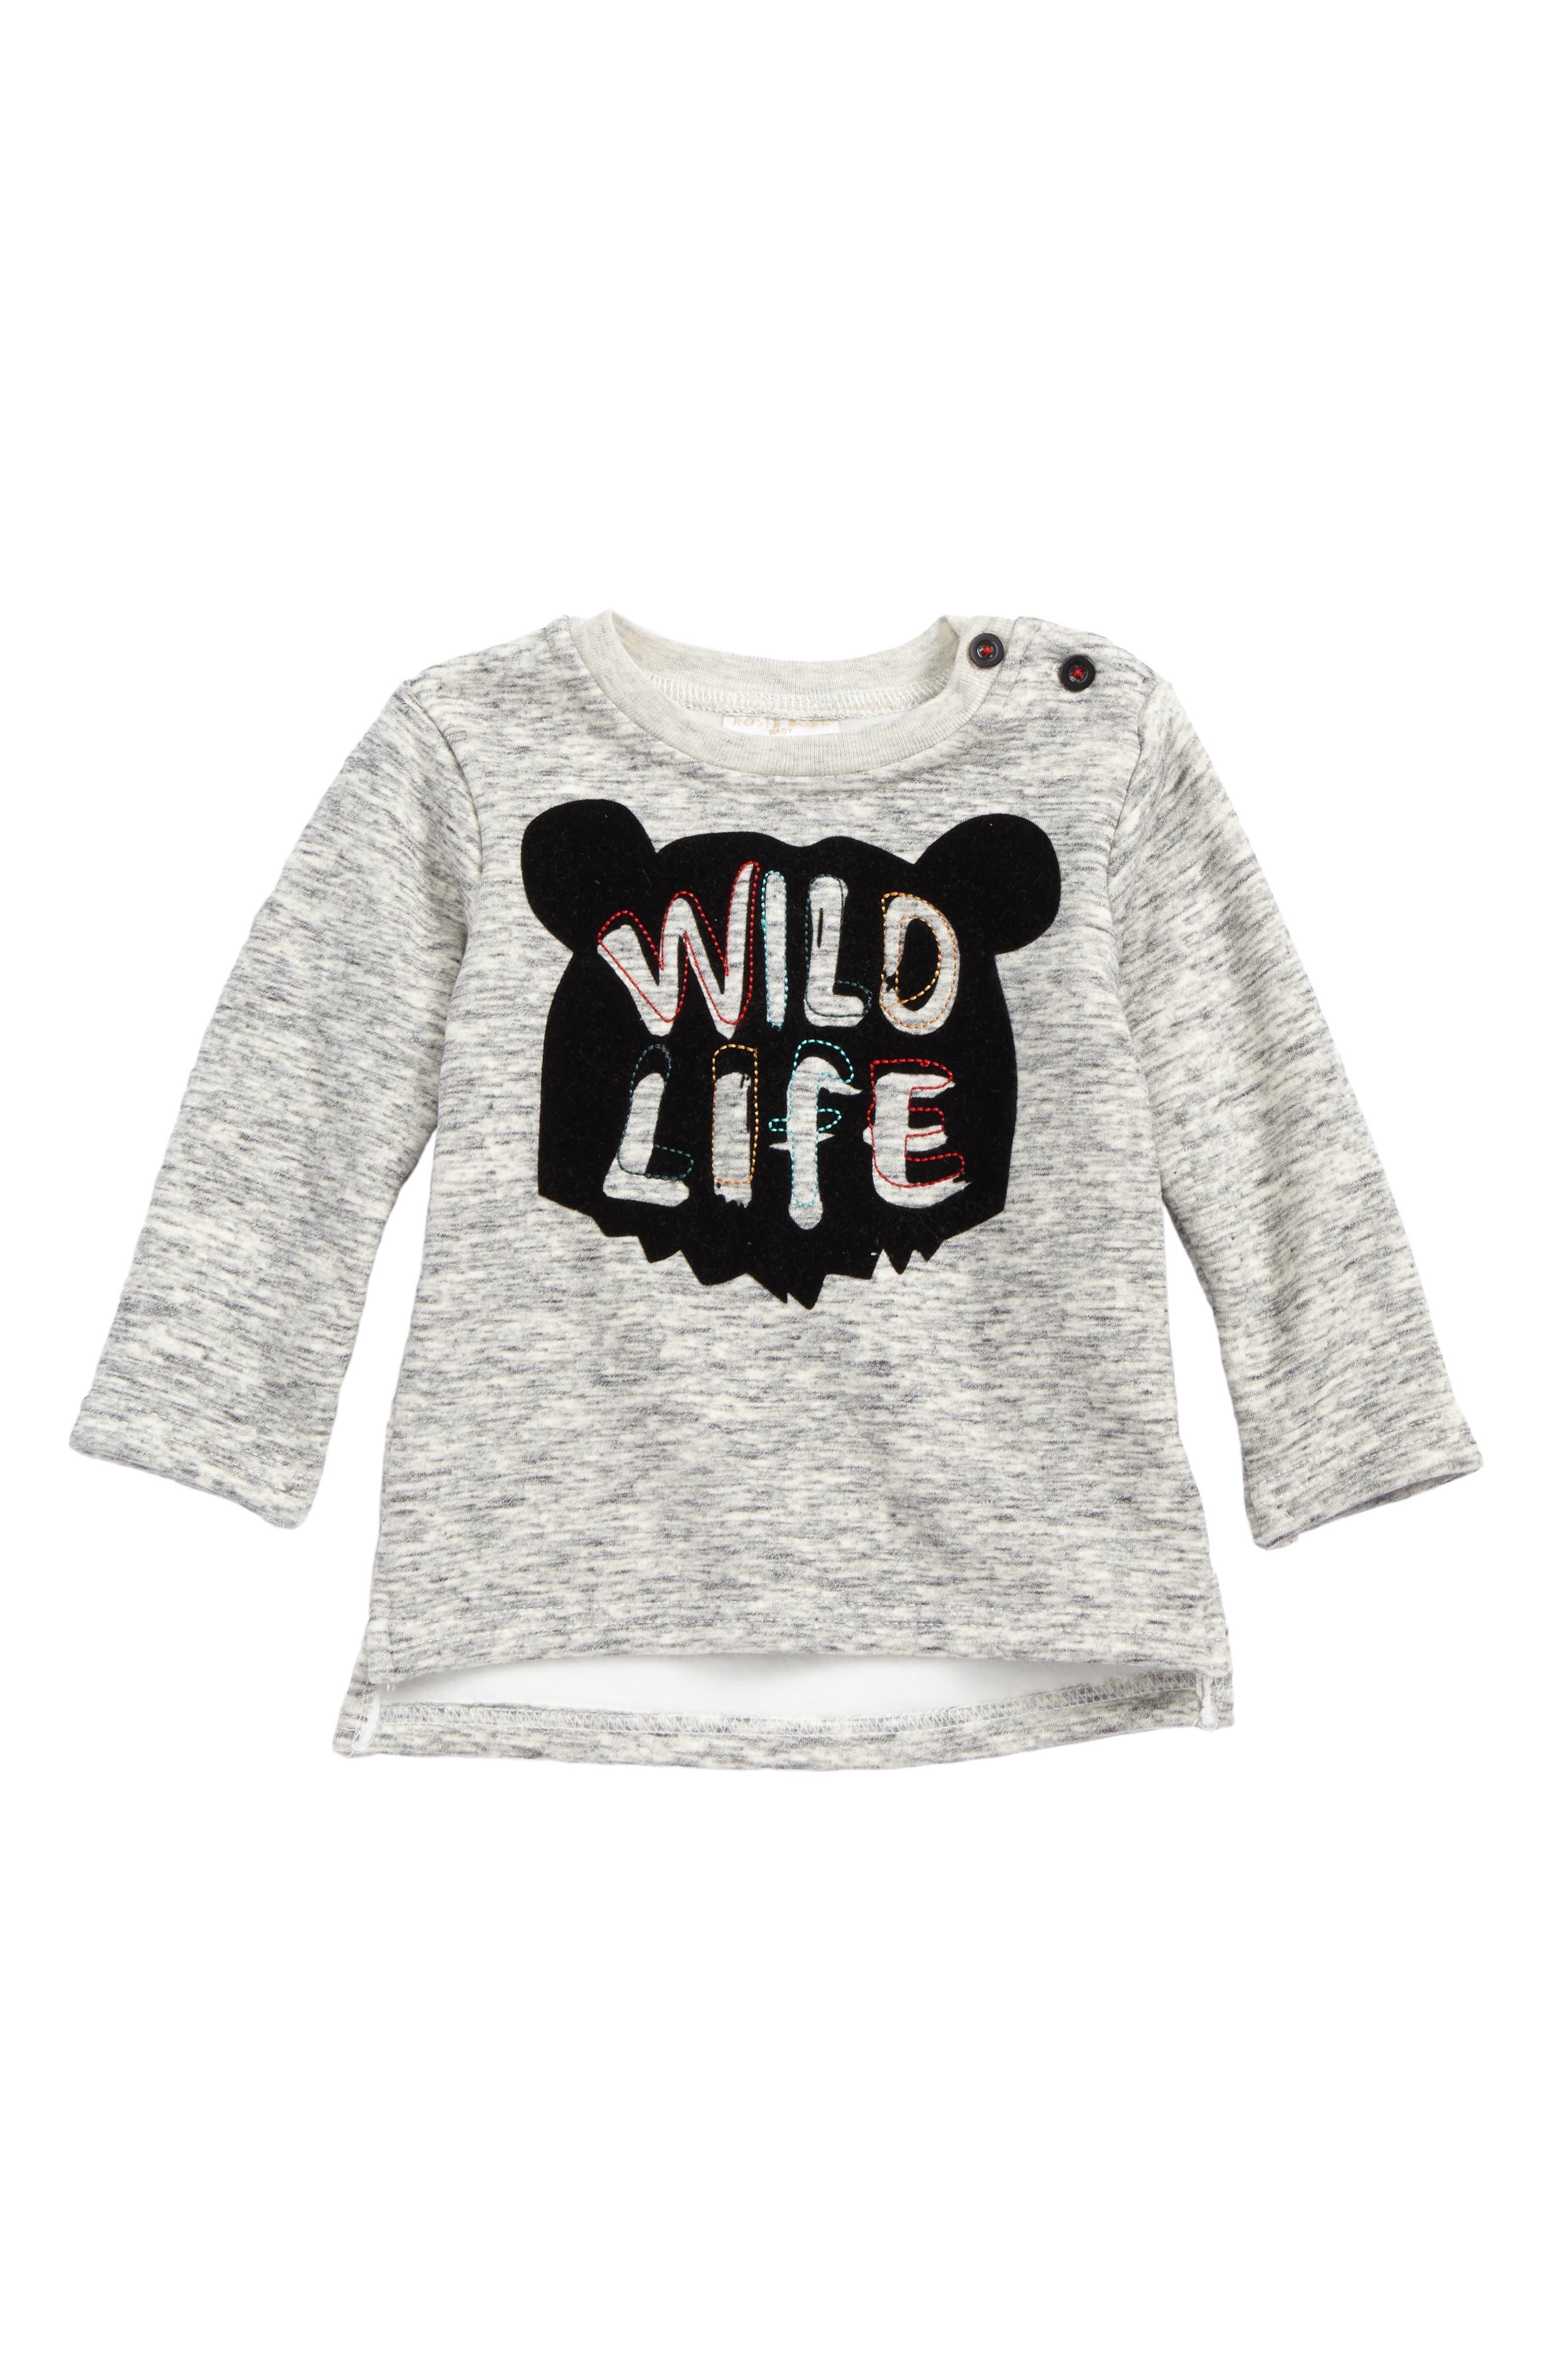 Wild Life Sweatshirt,                             Main thumbnail 1, color,                             030